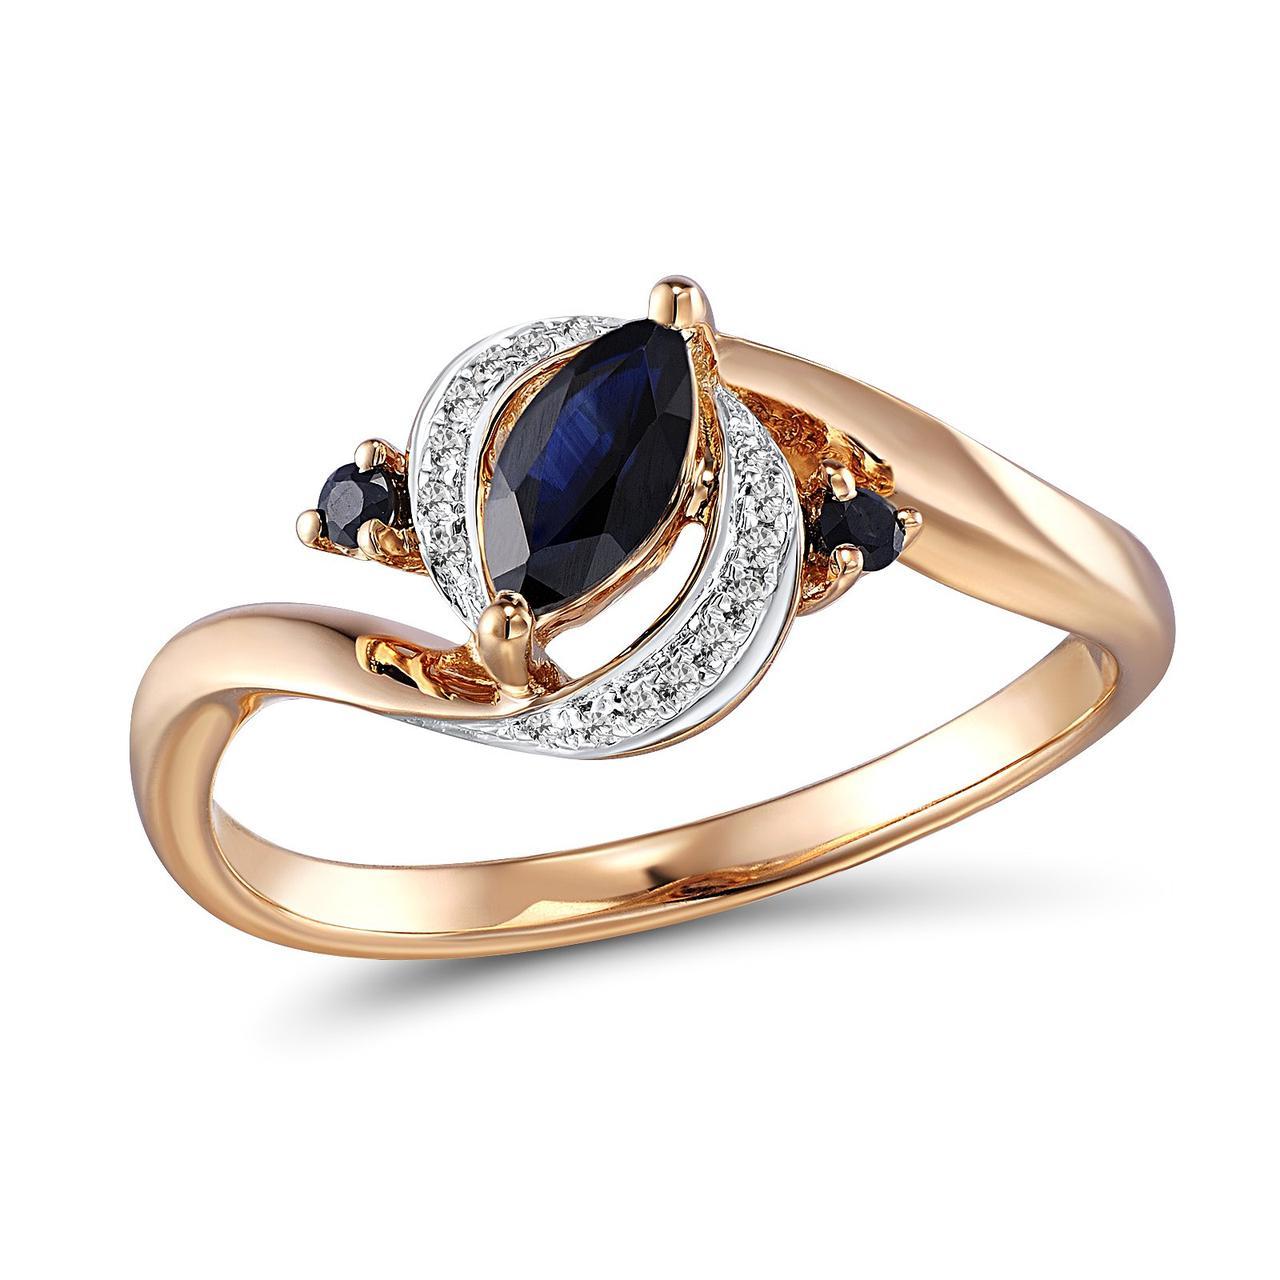 Золотое кольцо с бриллиантами и сапфирами, размер 16 (258988)